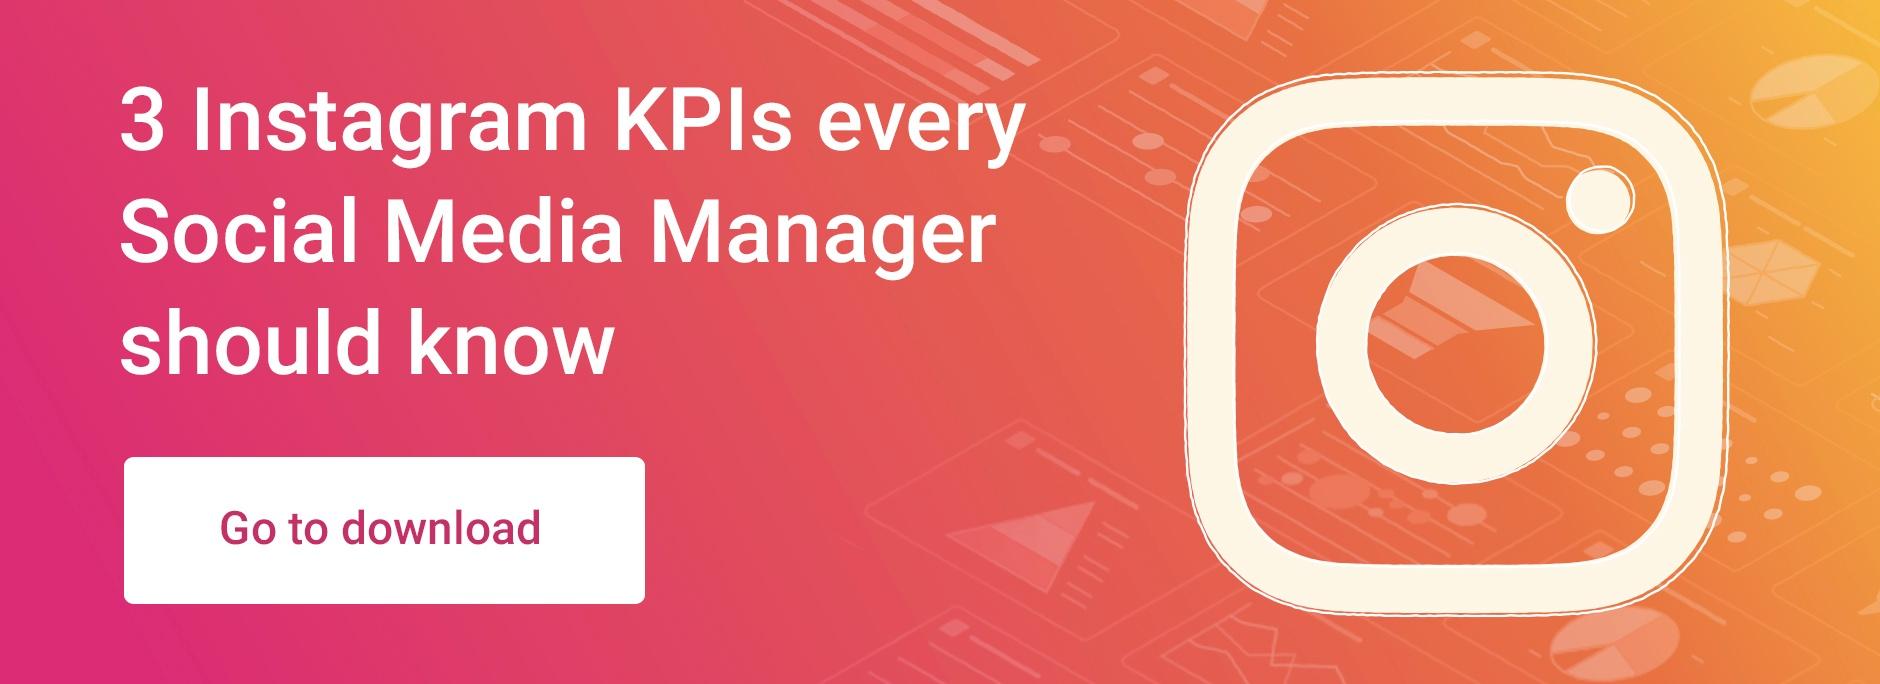 3 KPIs Social Media Manager